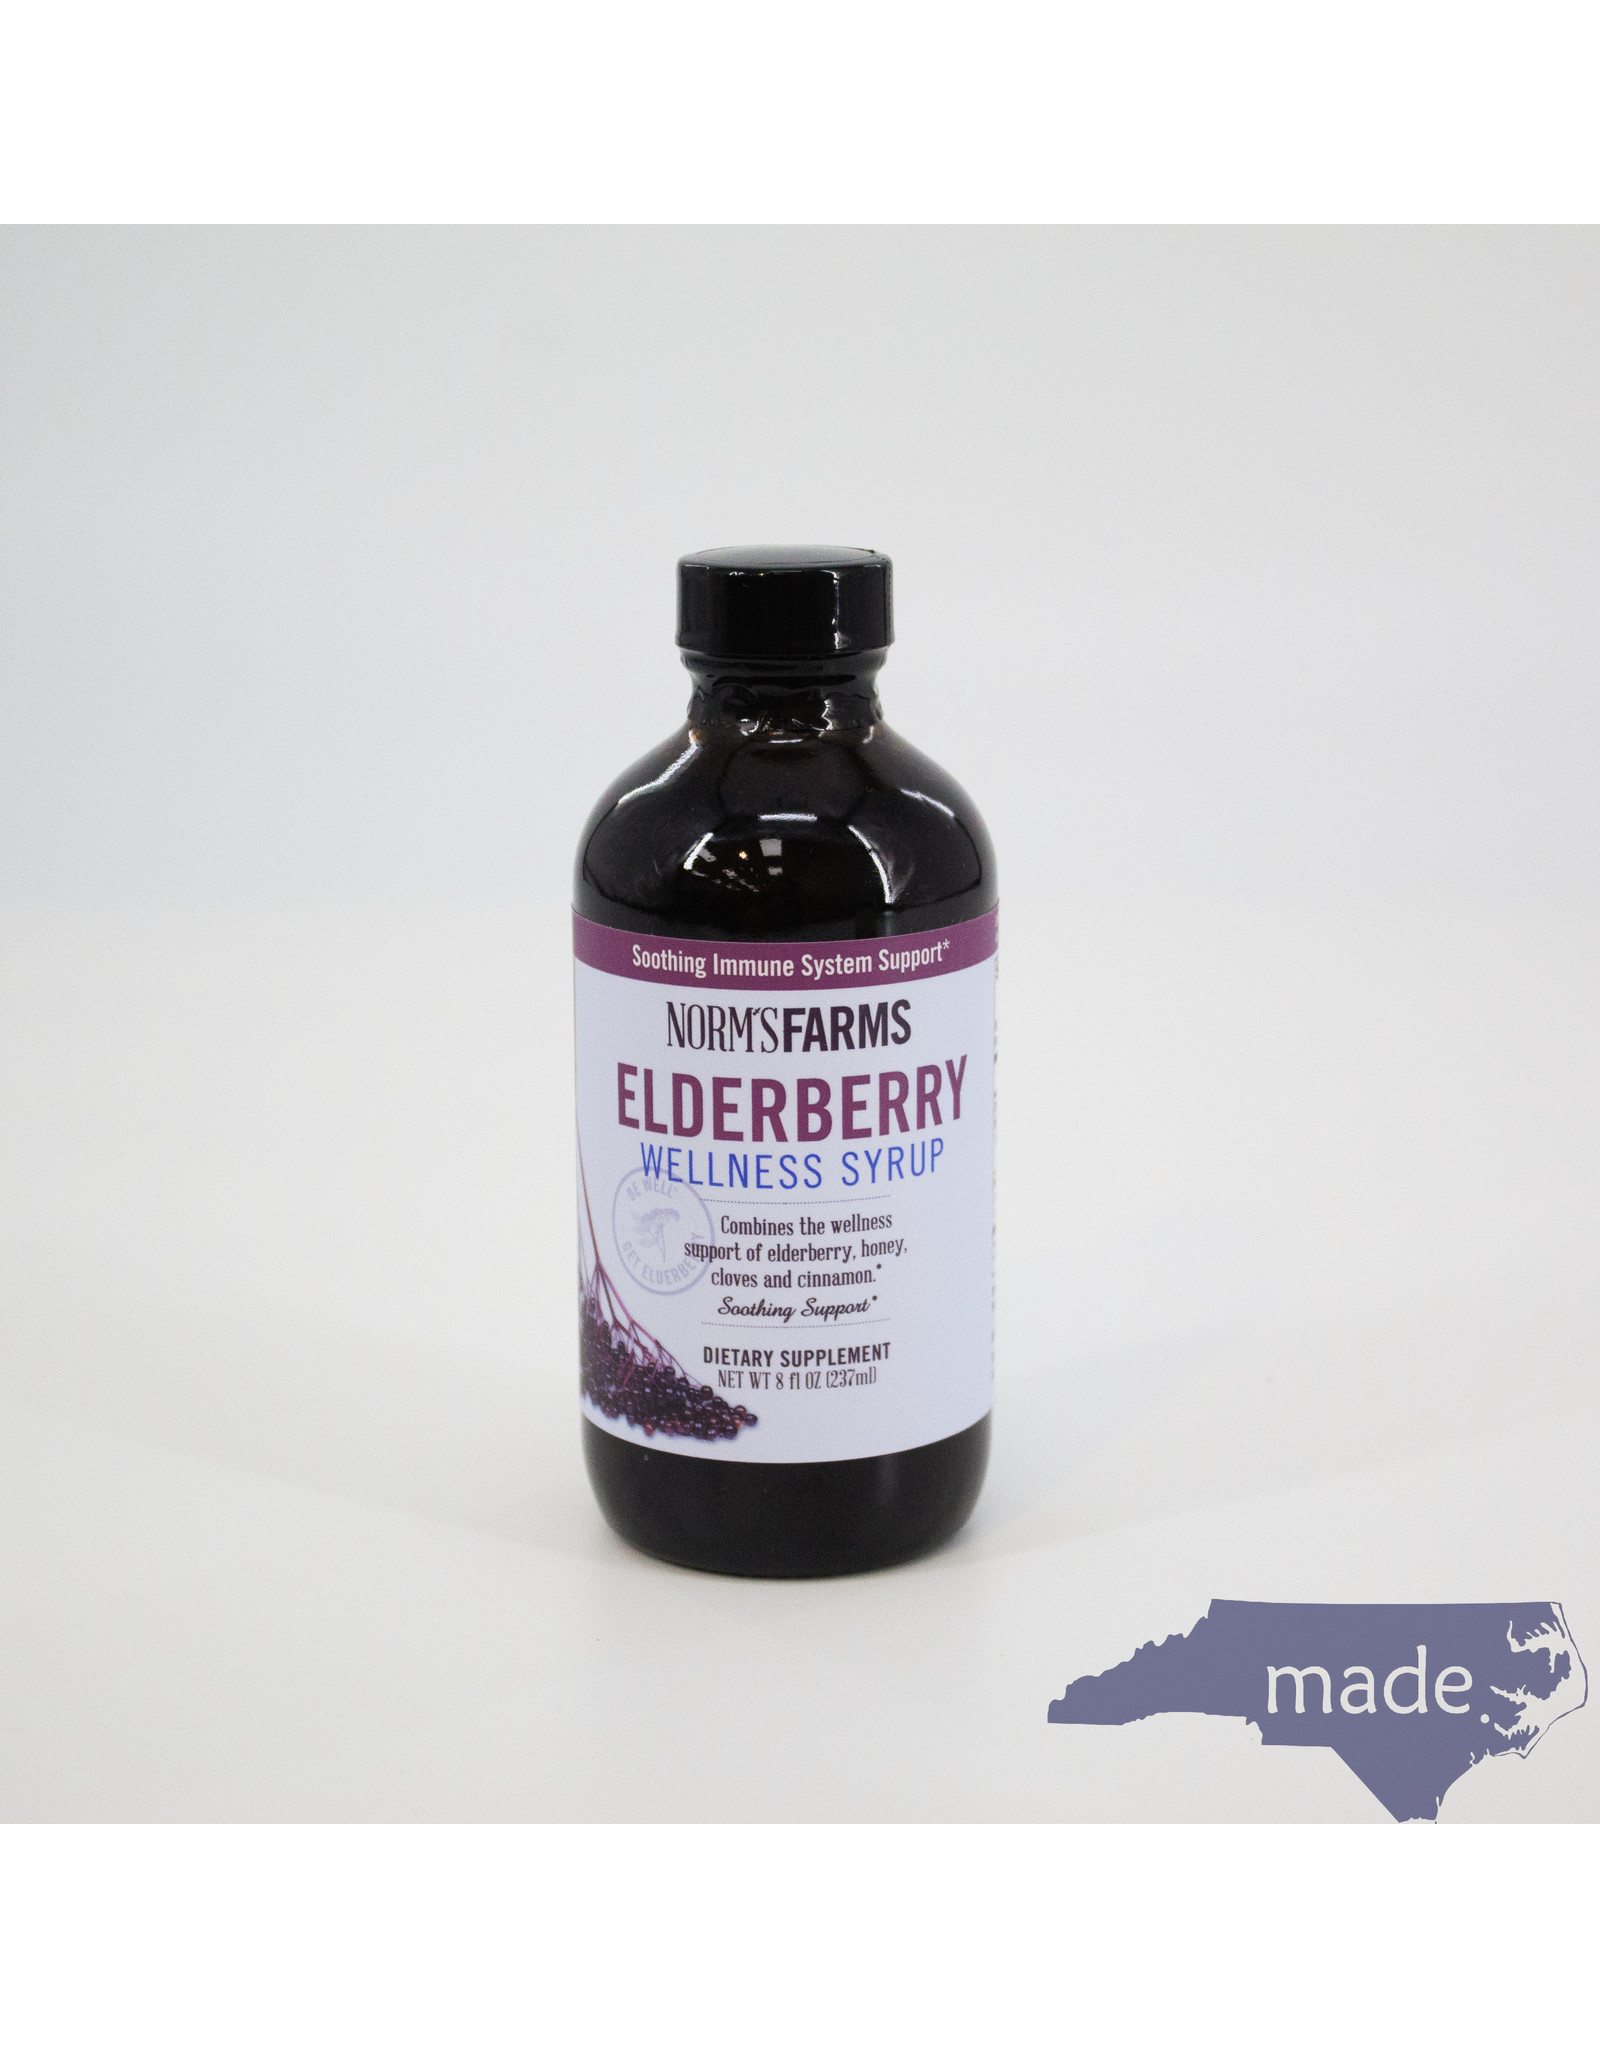 Norm's Farms Elderberry Wellness Syrup - Norm's Farms